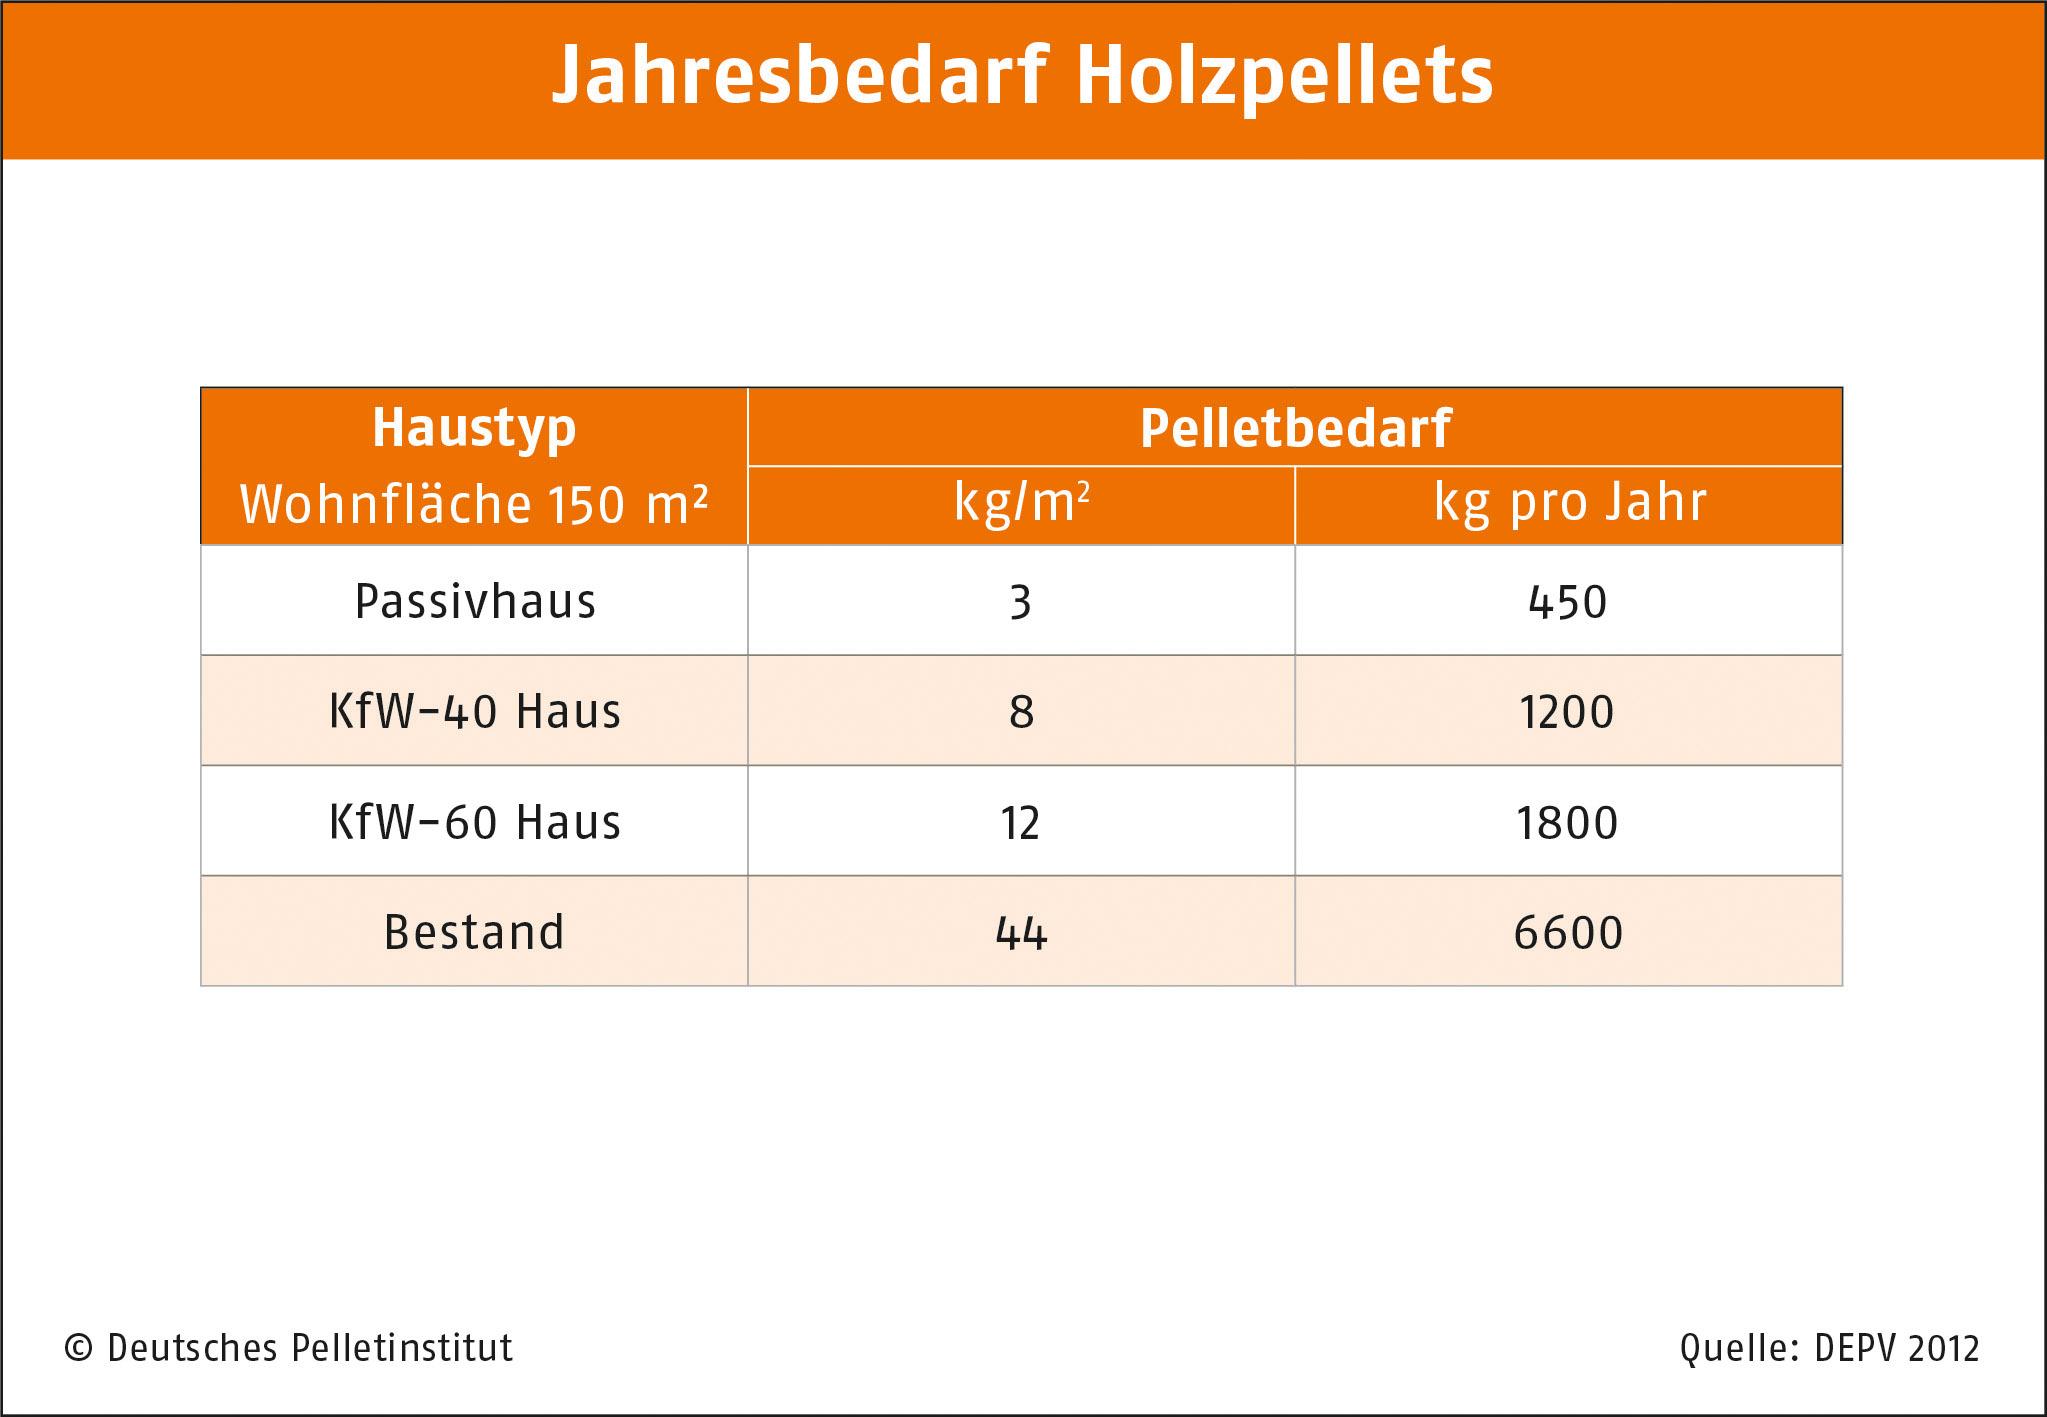 DEPI_Jahresbedarf Holzpellets